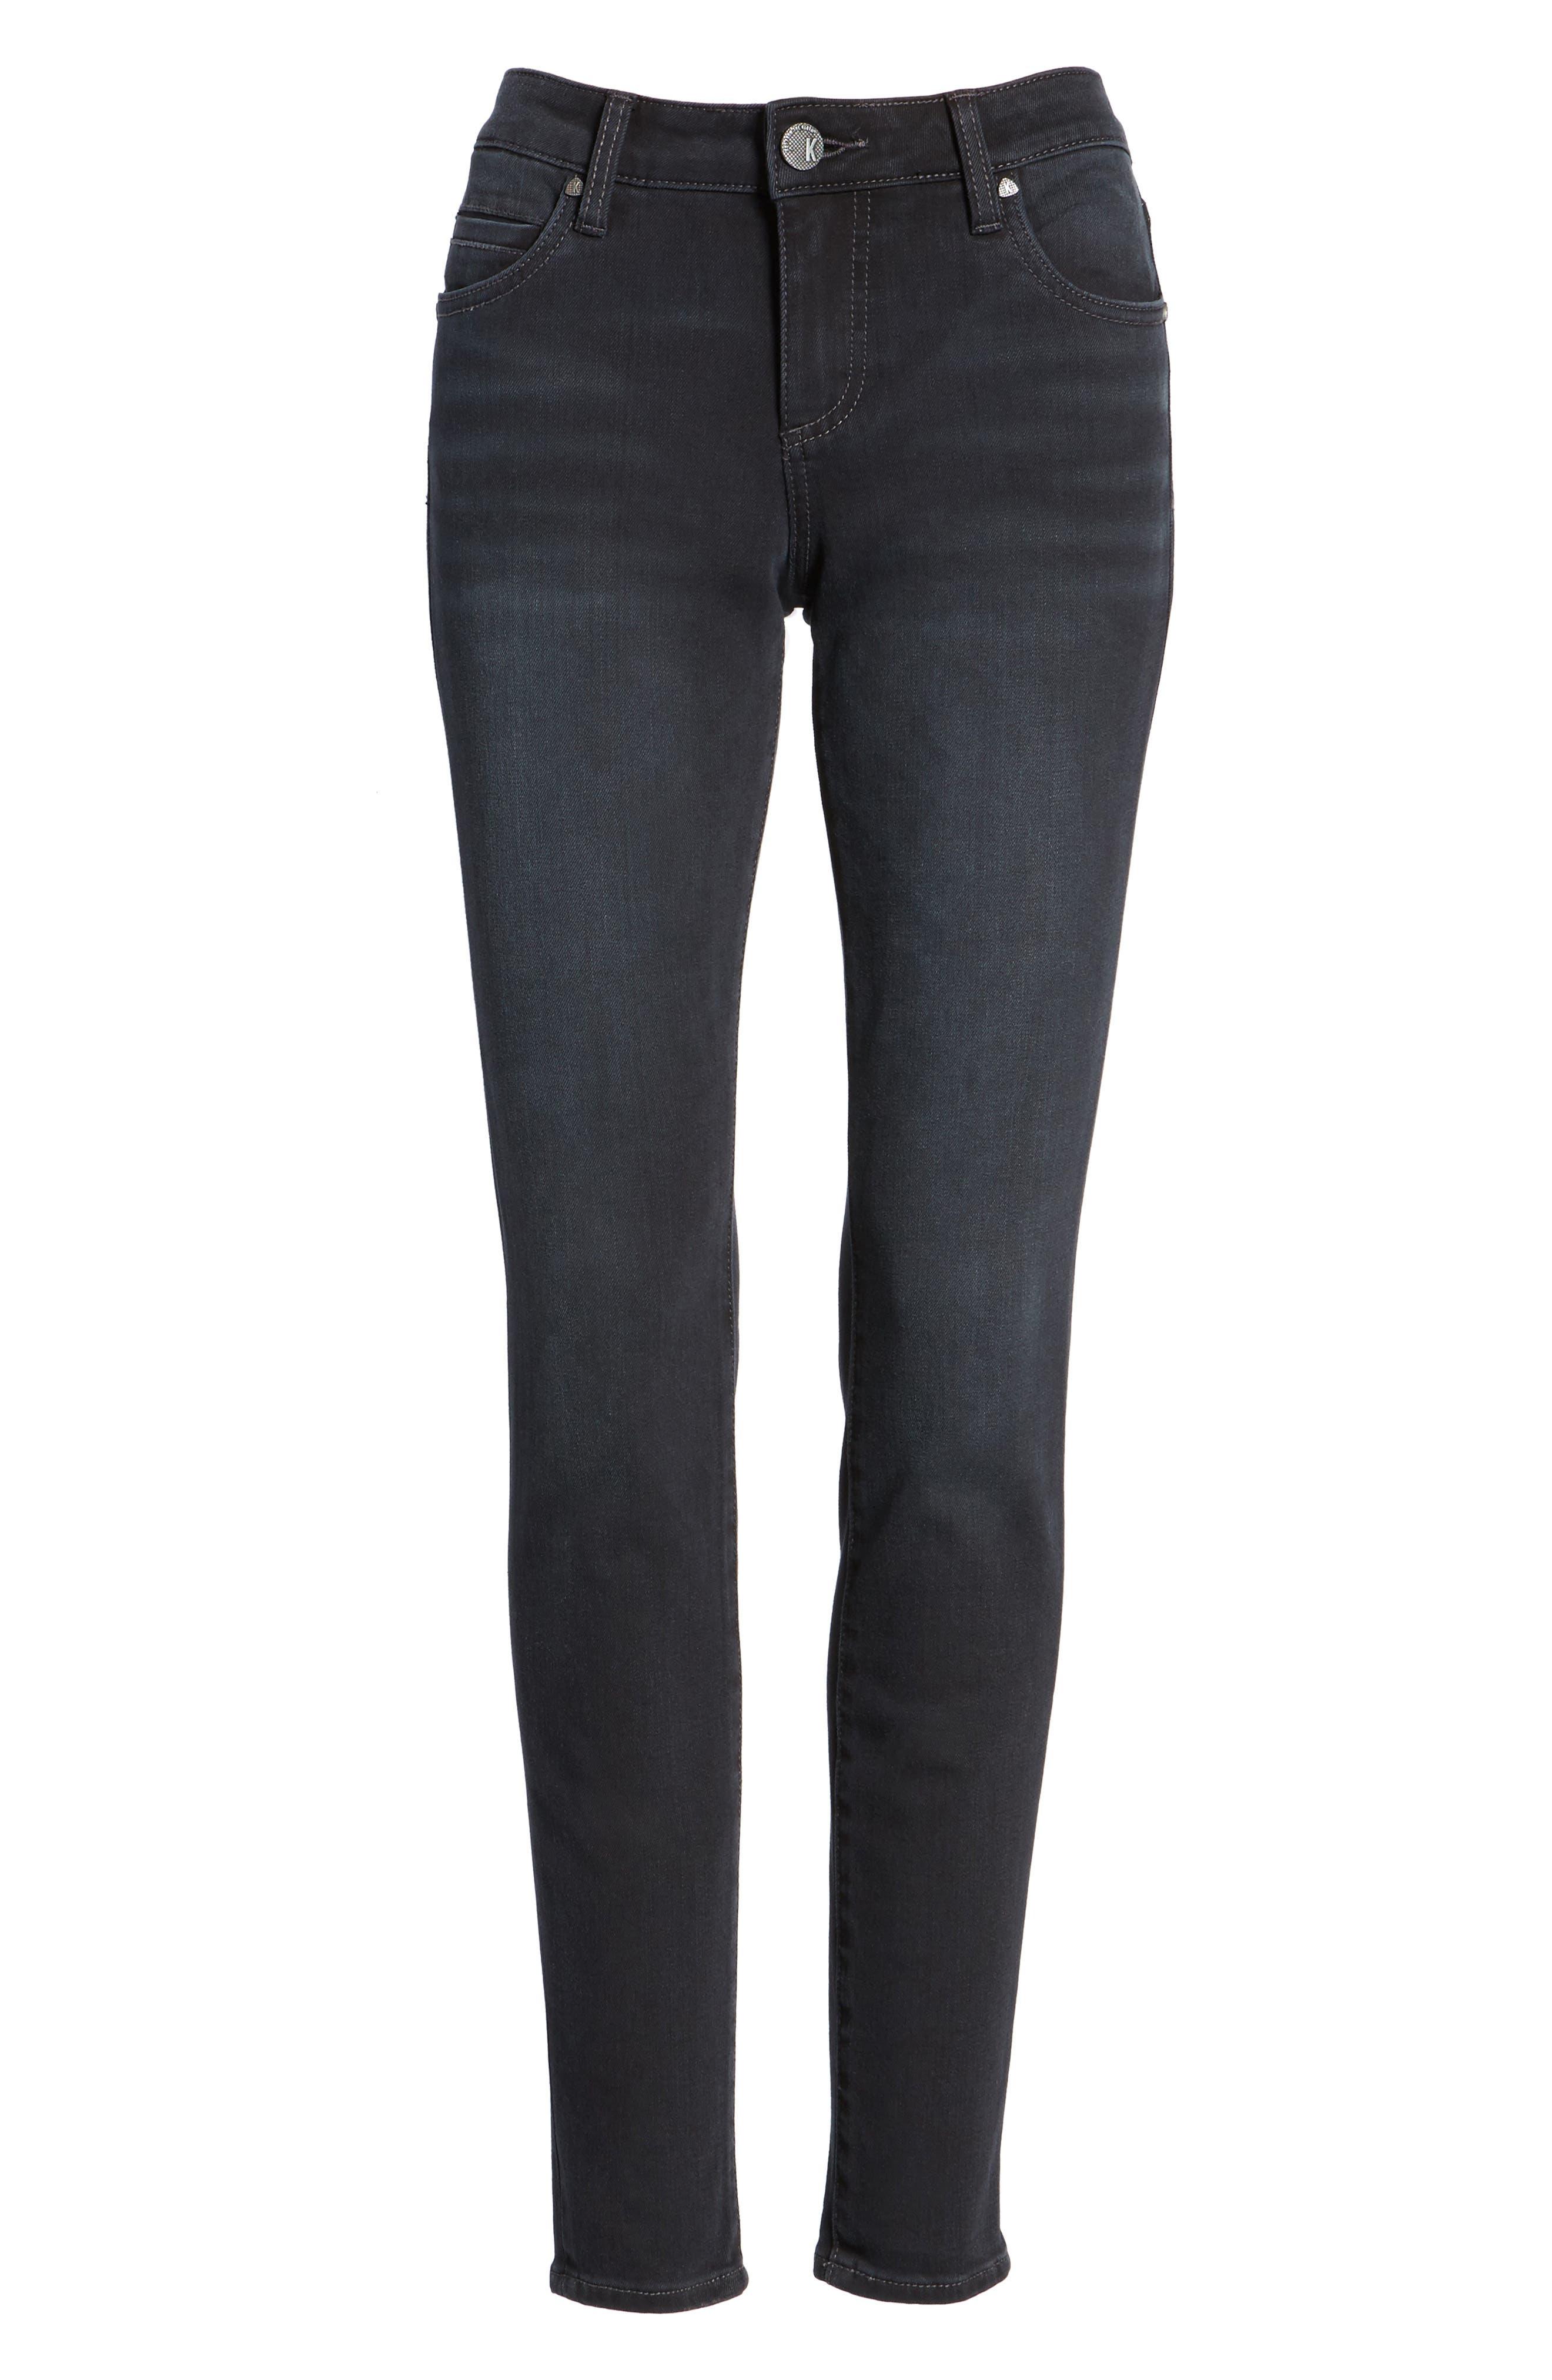 Mia Toothpick Skinny Jeans,                             Alternate thumbnail 6, color,                             071